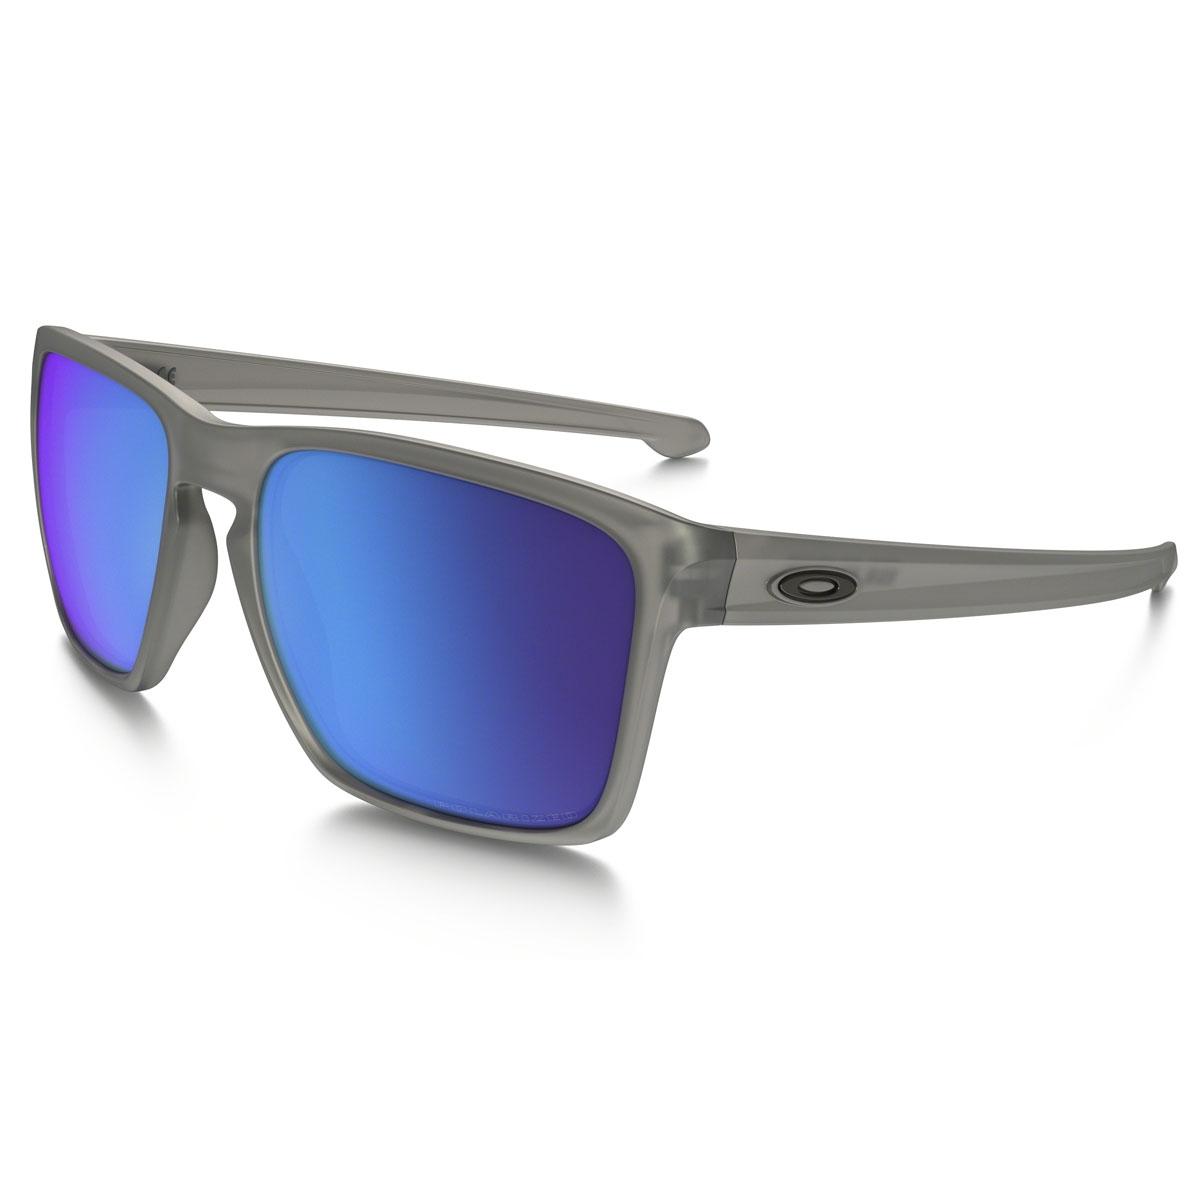 c1c9ba19e00 Image of Oakley Sliver XL Polarized Sunglasses - Matte Grey Frame    Sapphire Iridium Lens